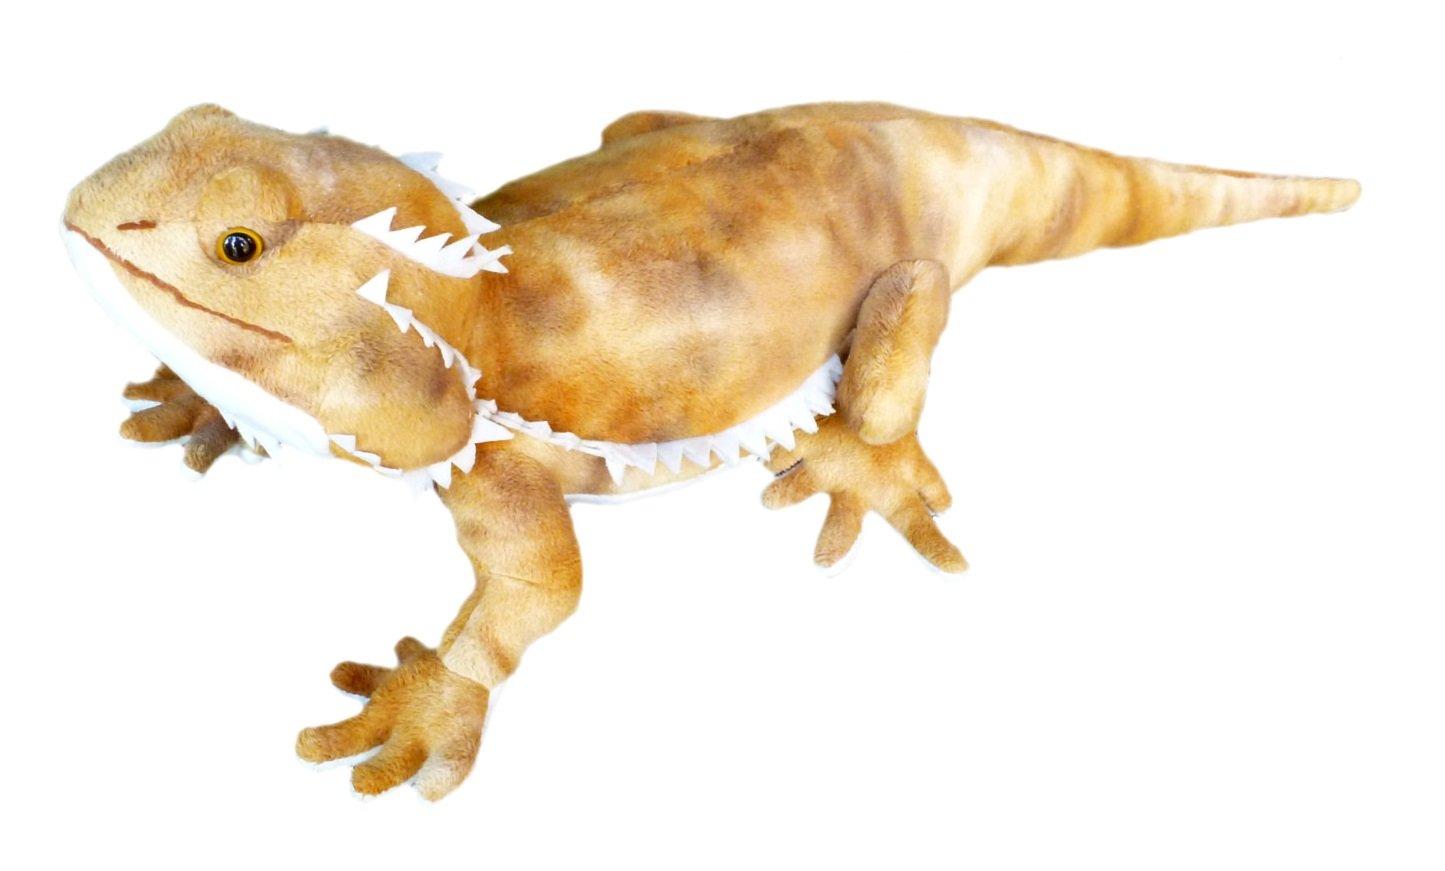 Adore 21'' Pogo The Bearded Dragon Lizard Stuffed Animal Plush Toy by Adore Plush Company